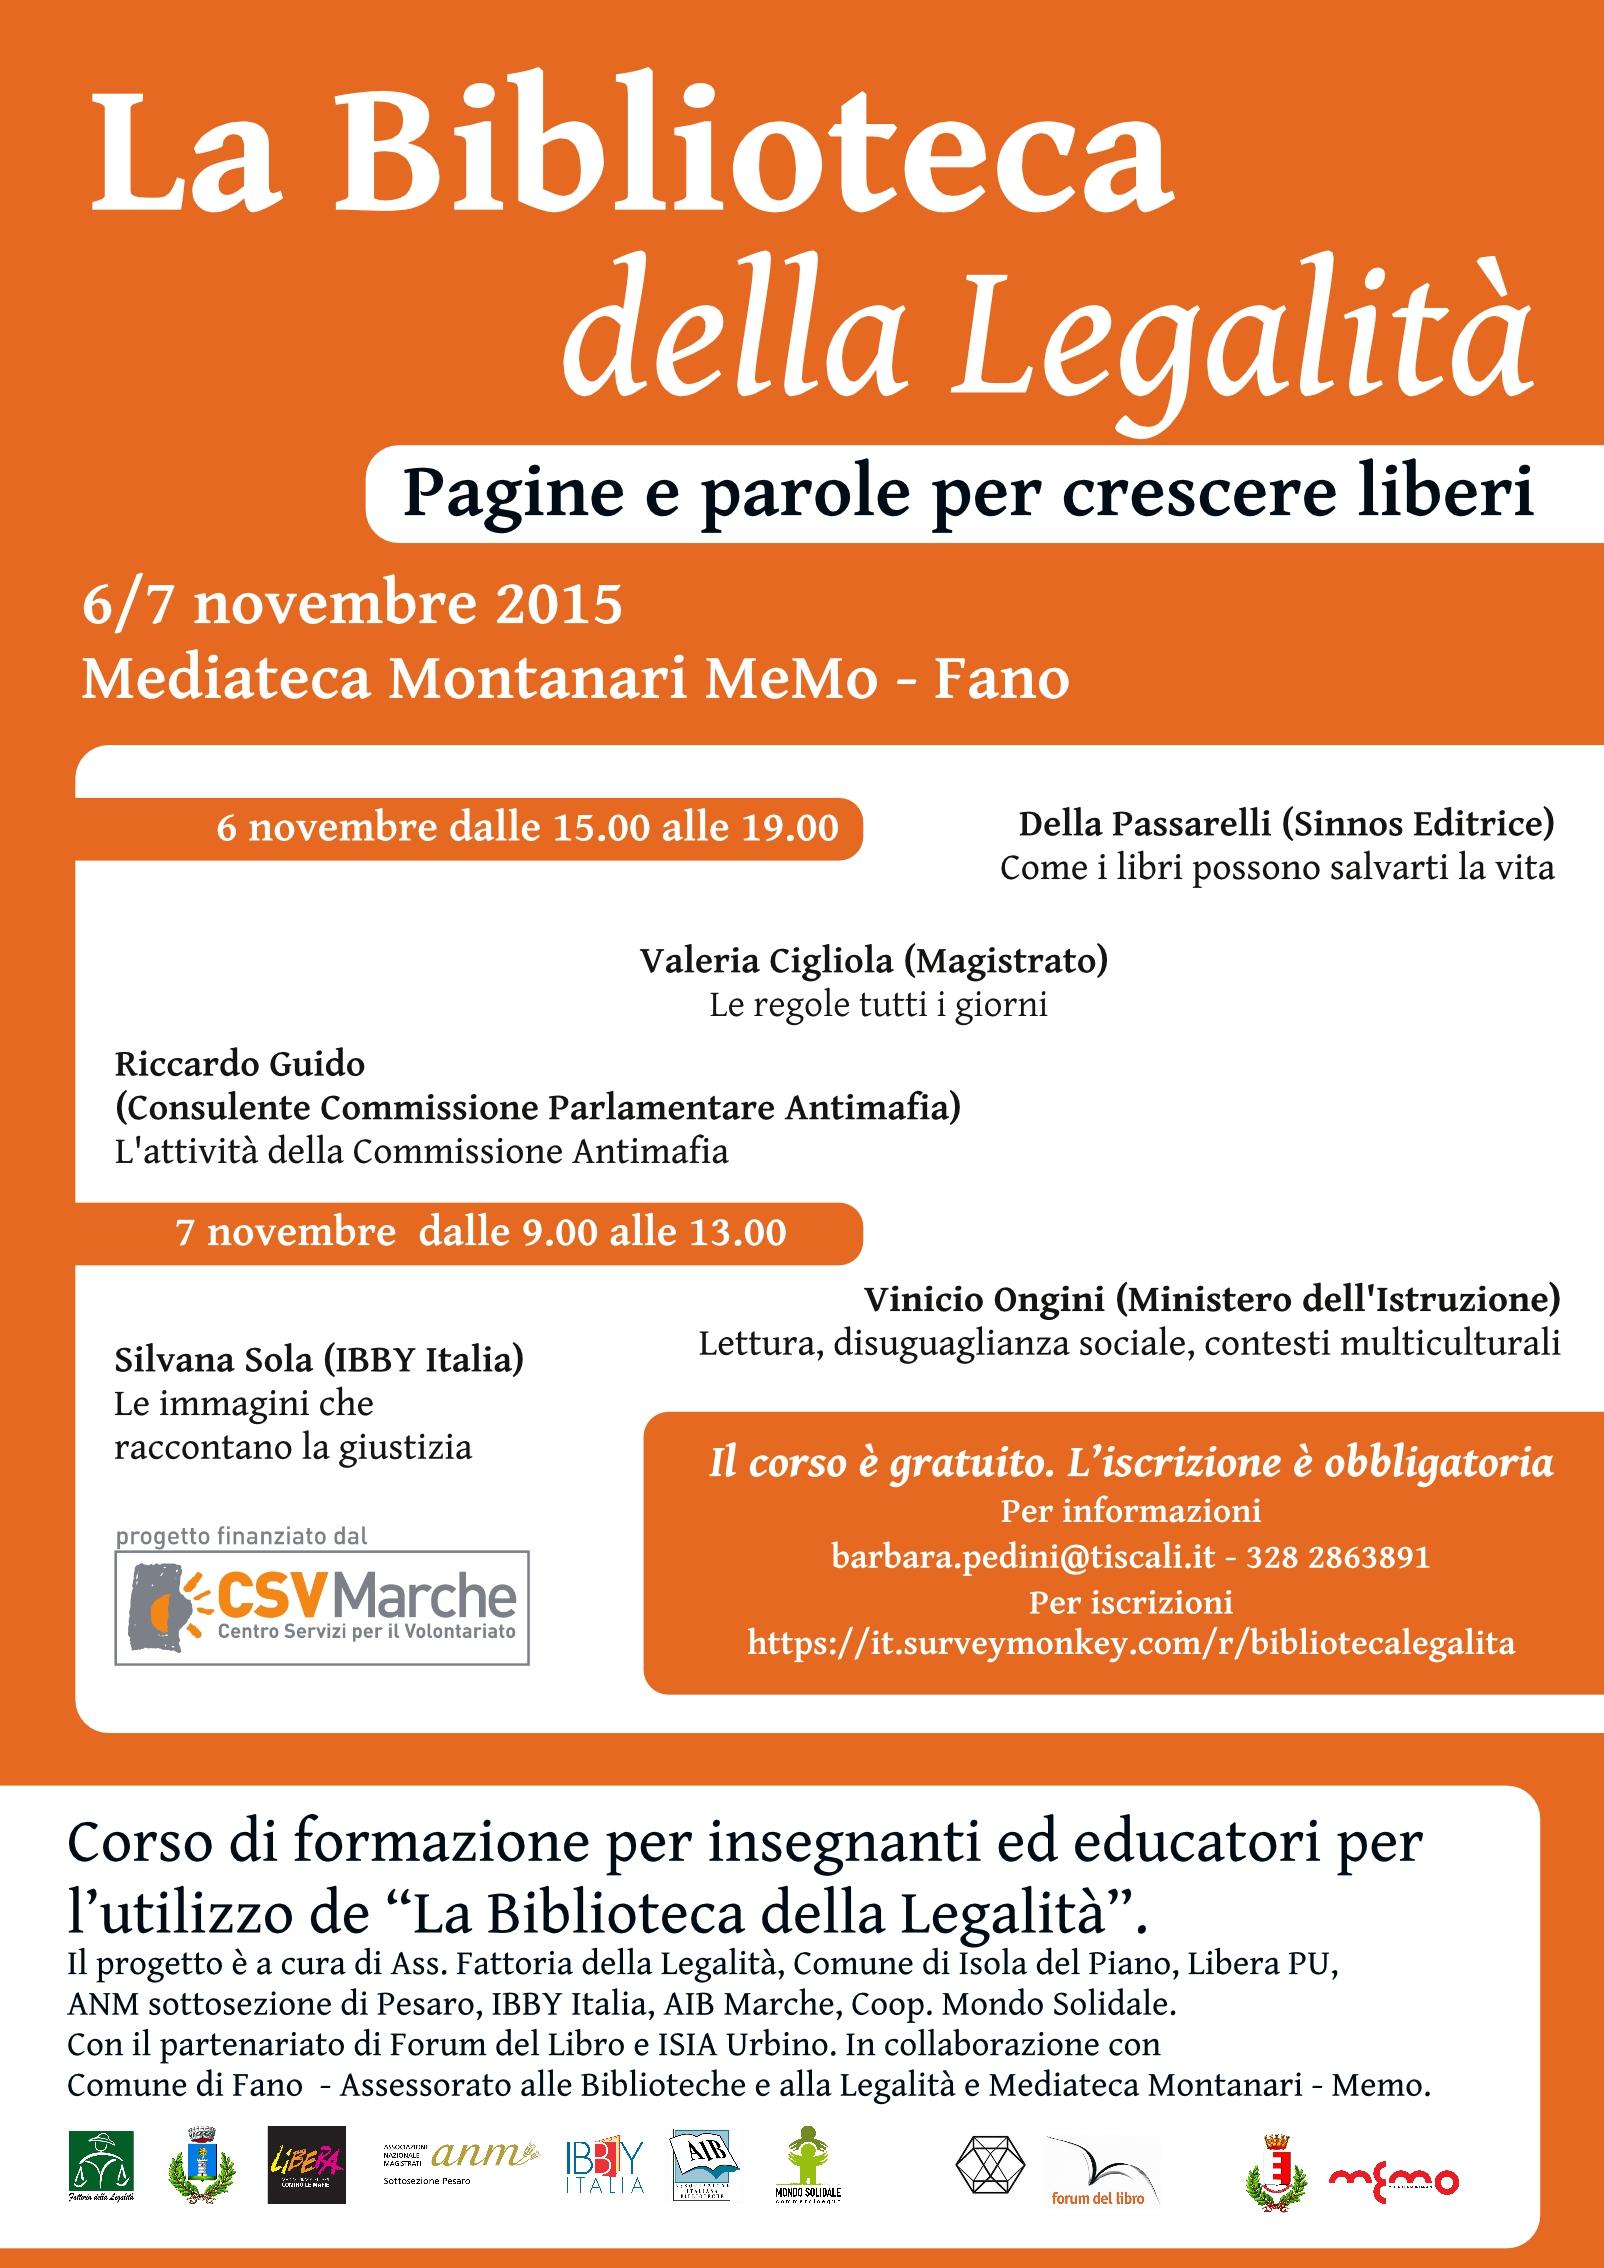 http://www.fattoriadellalegalita.it/wp-content/uploads/2015/10/Locandina-fronte.jpeg